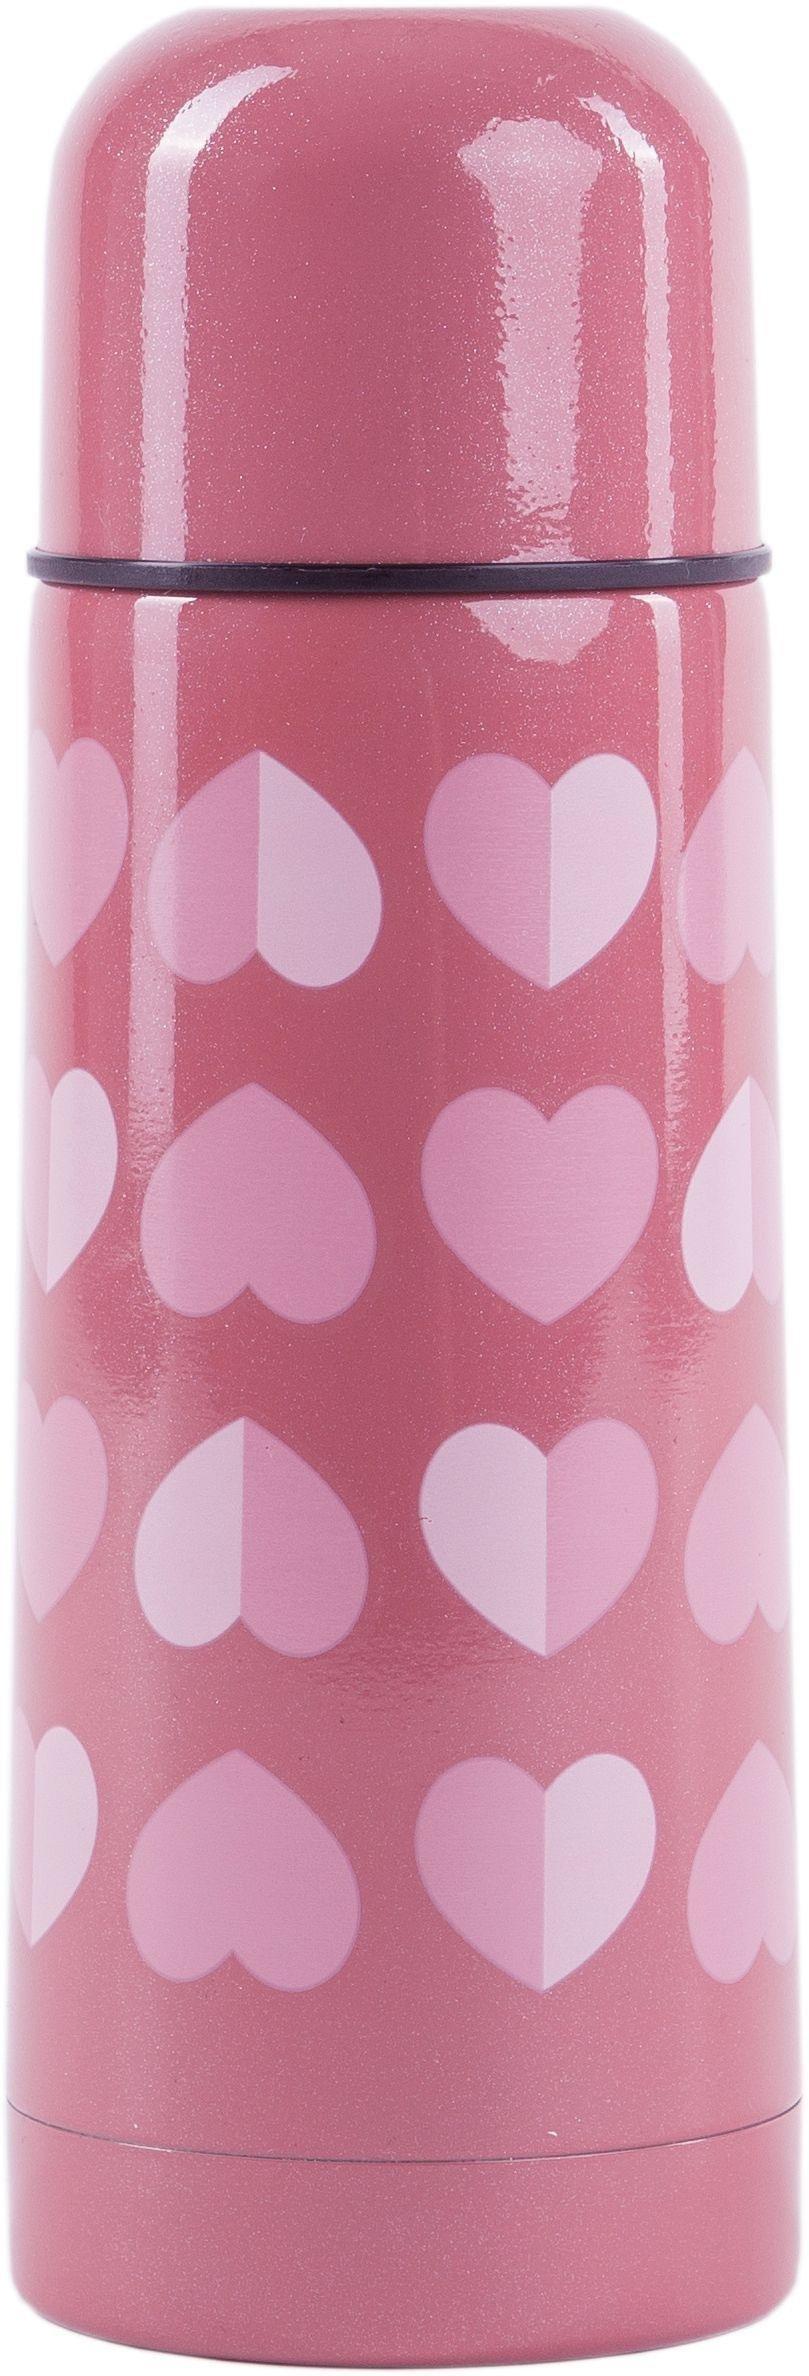 Image of Beau and Elliot - Confetti 350ml Vacuum Flask - Pink